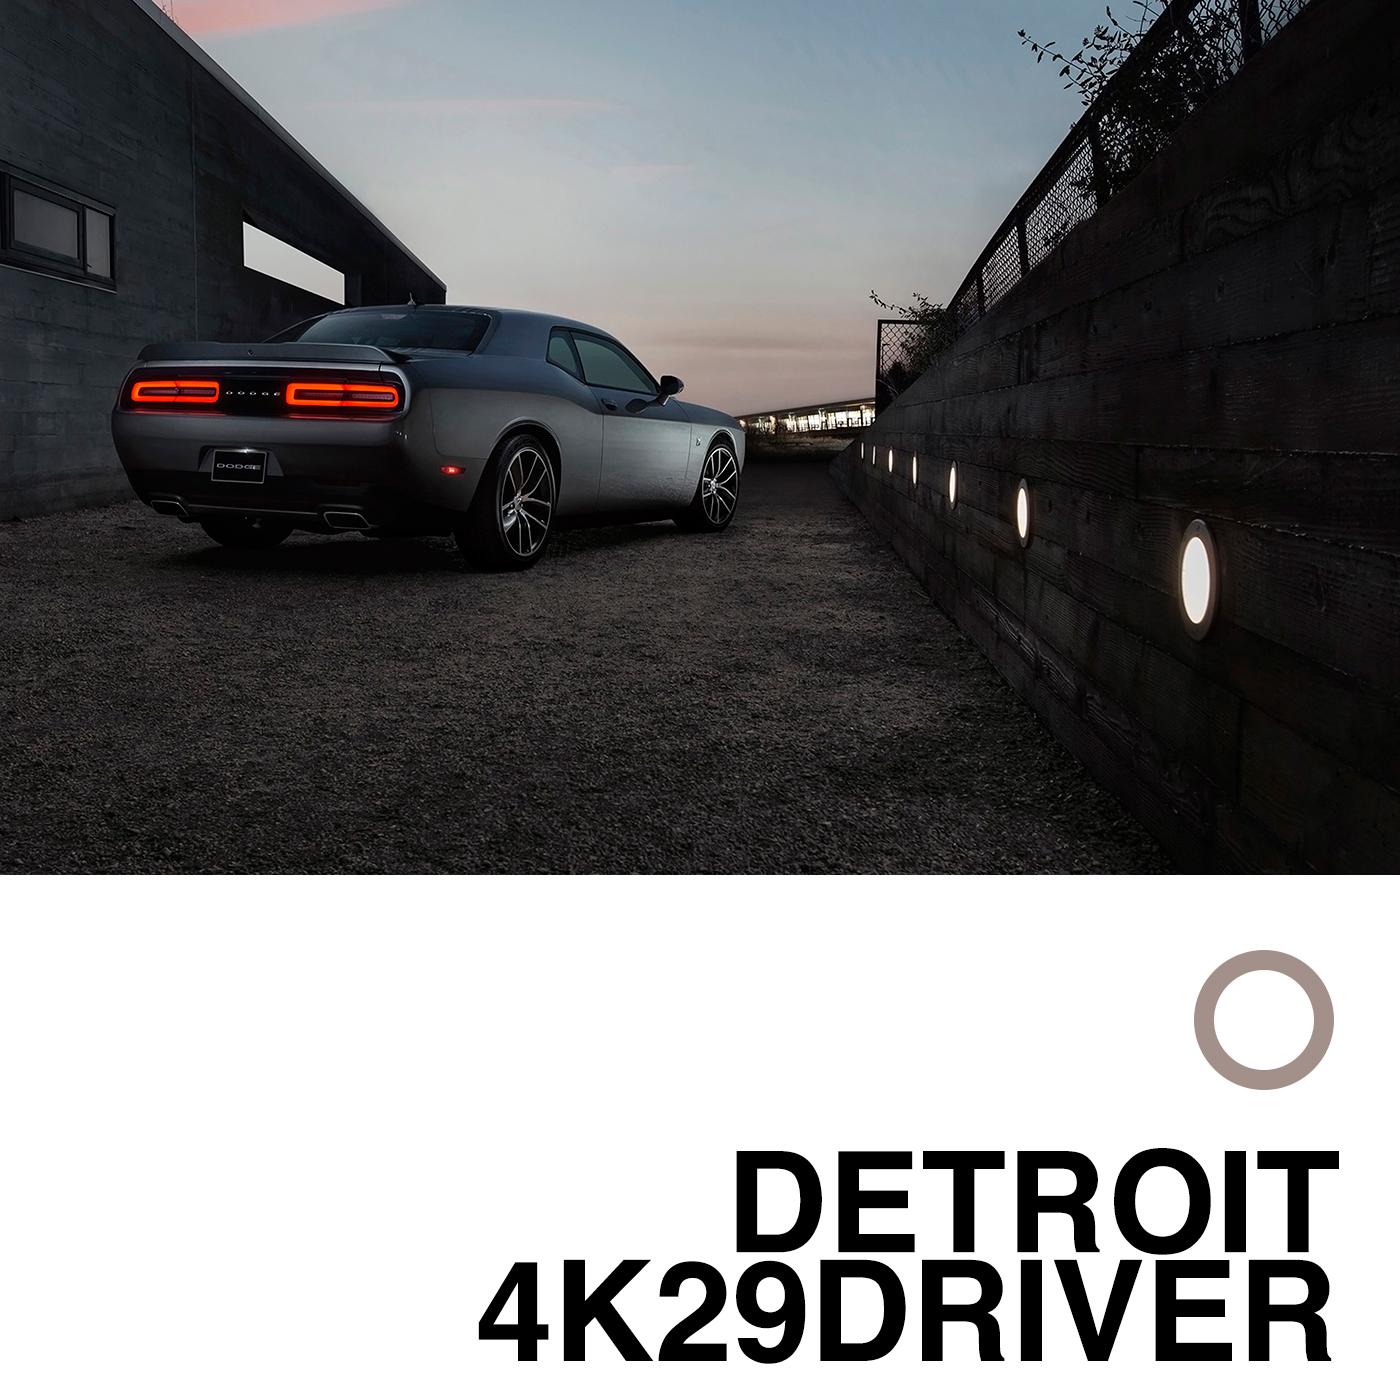 DETROIT 4K29DRIVER MOBILE640